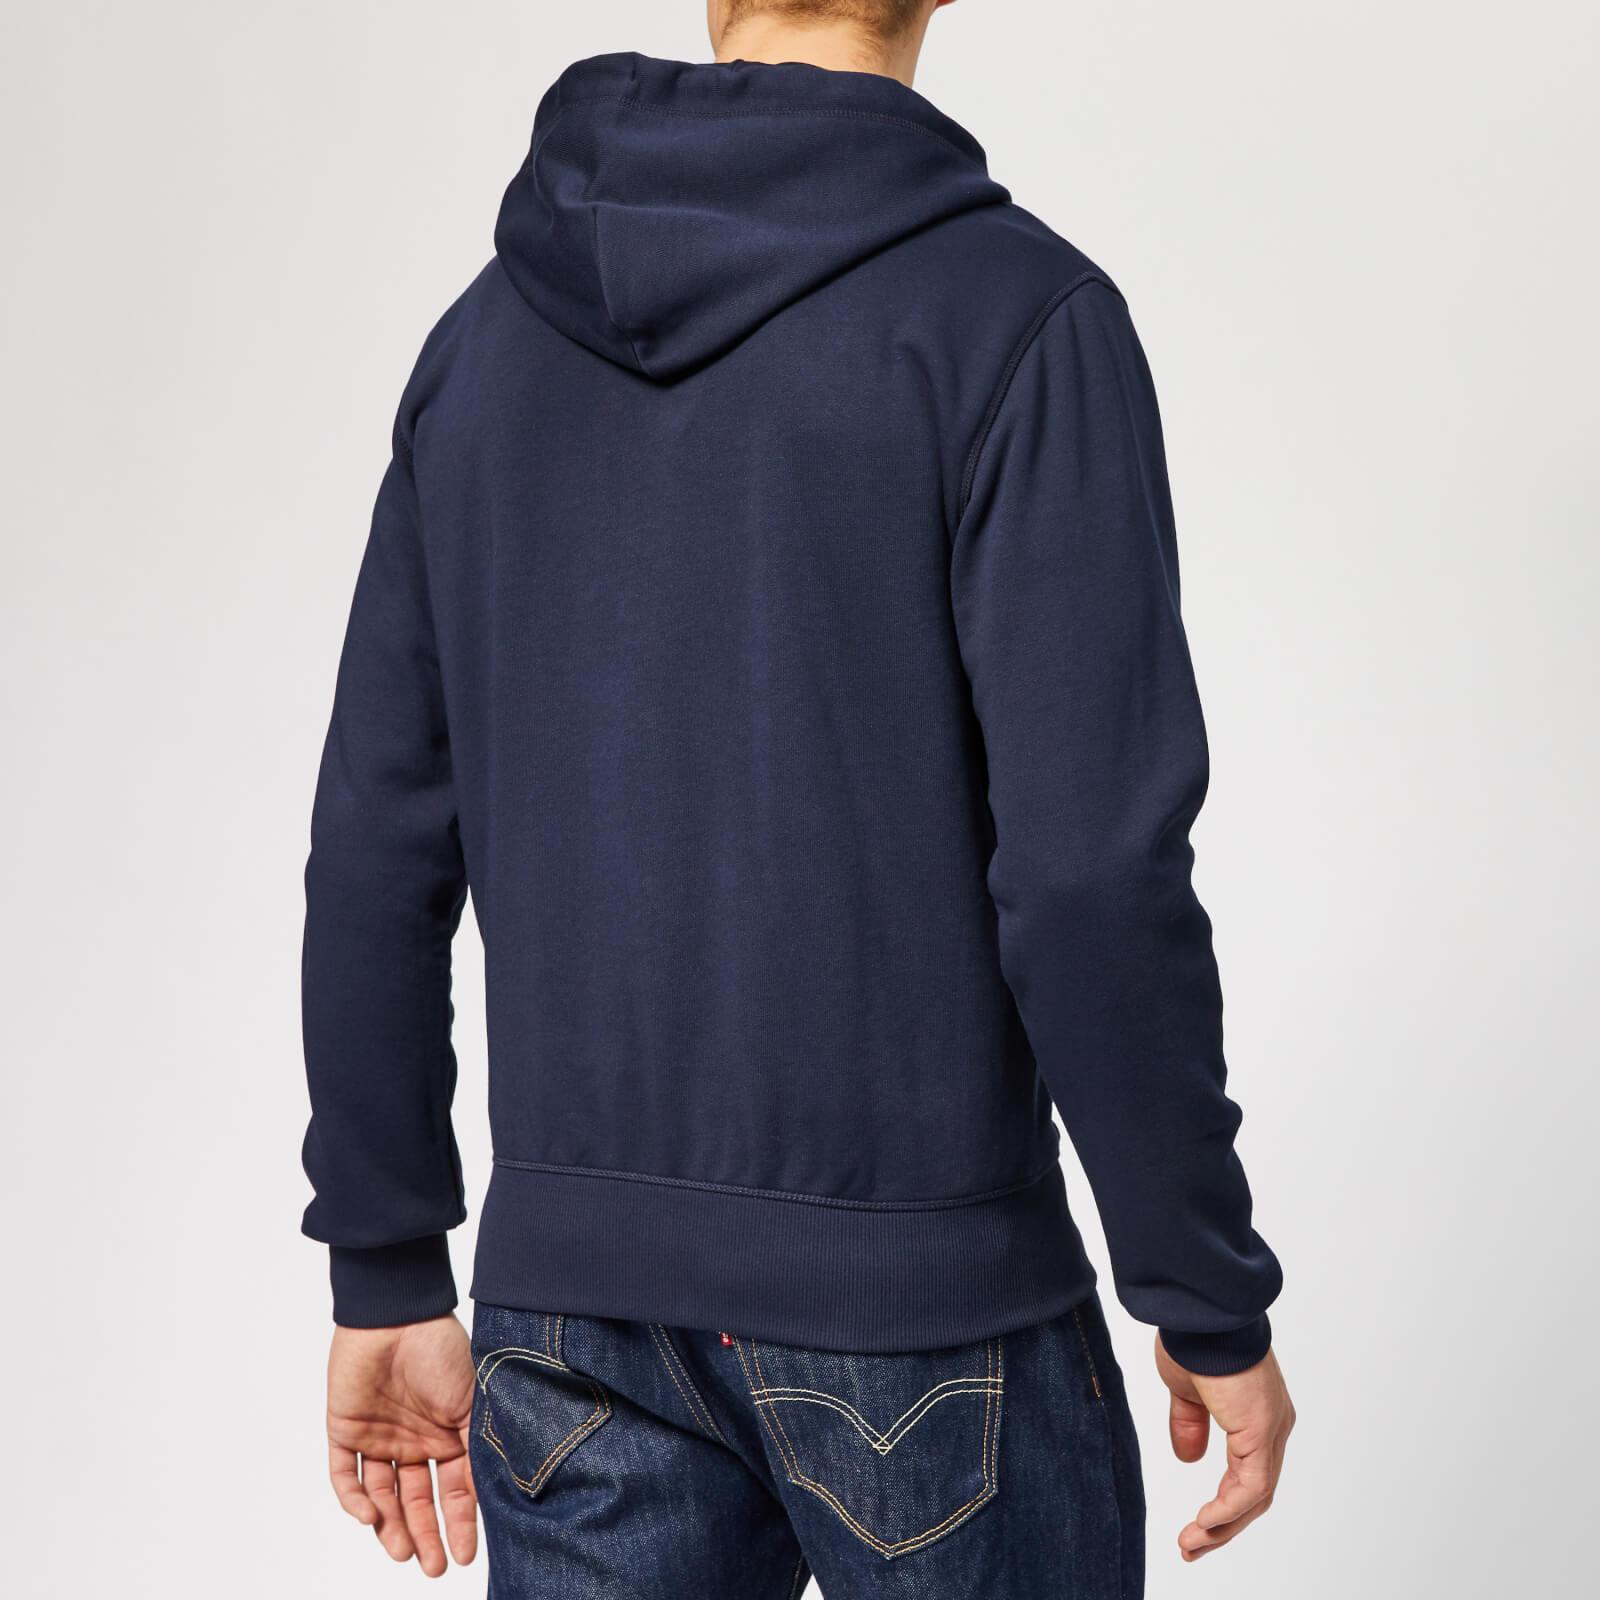 ff1311a0a2a GANT Men's The Original Full Zip Hoodie - Evening Blue Mens Clothing ...